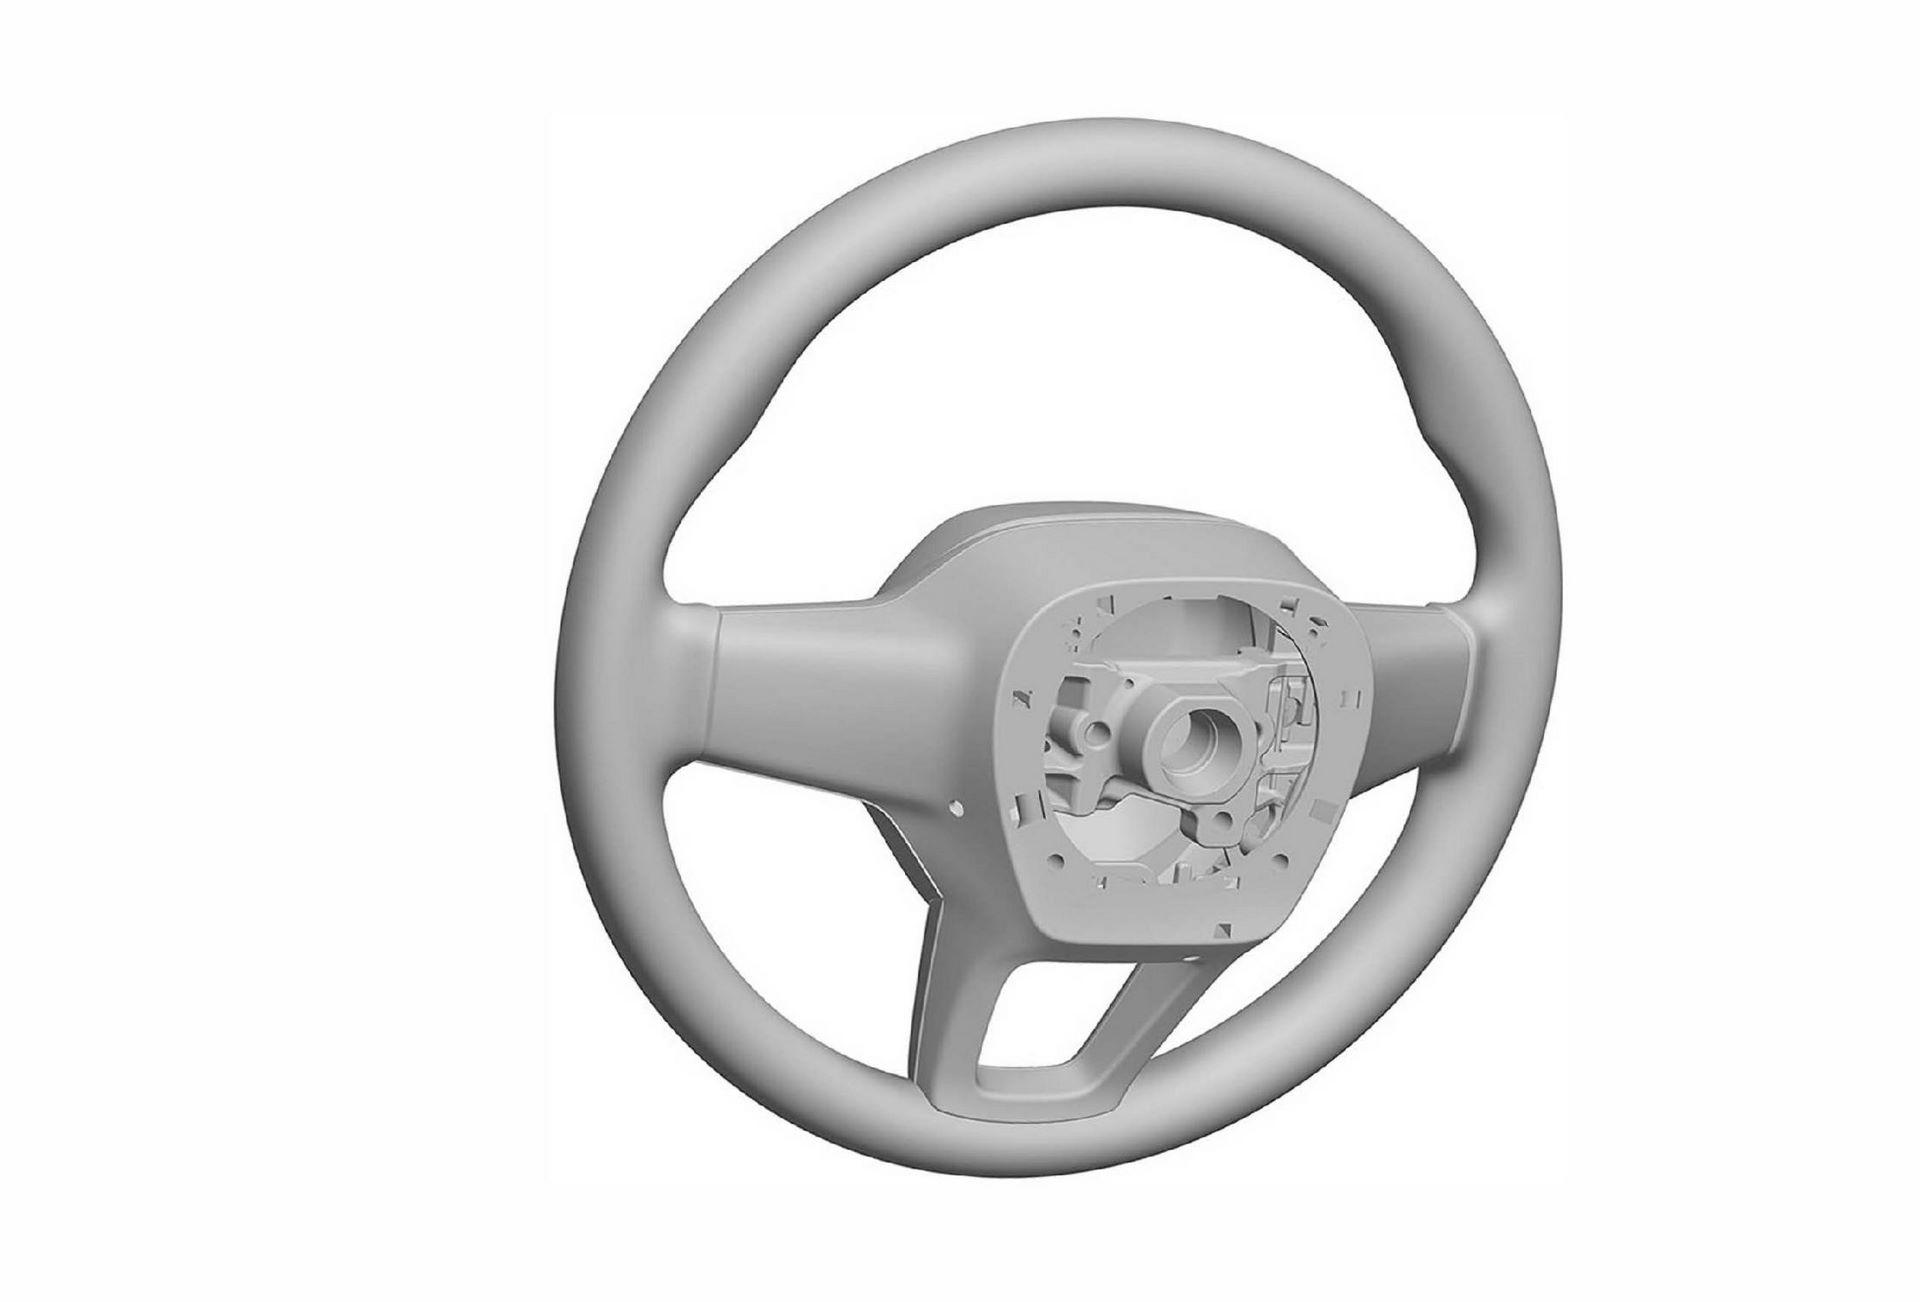 New-Honda-Civic-interior-patent-photos-10